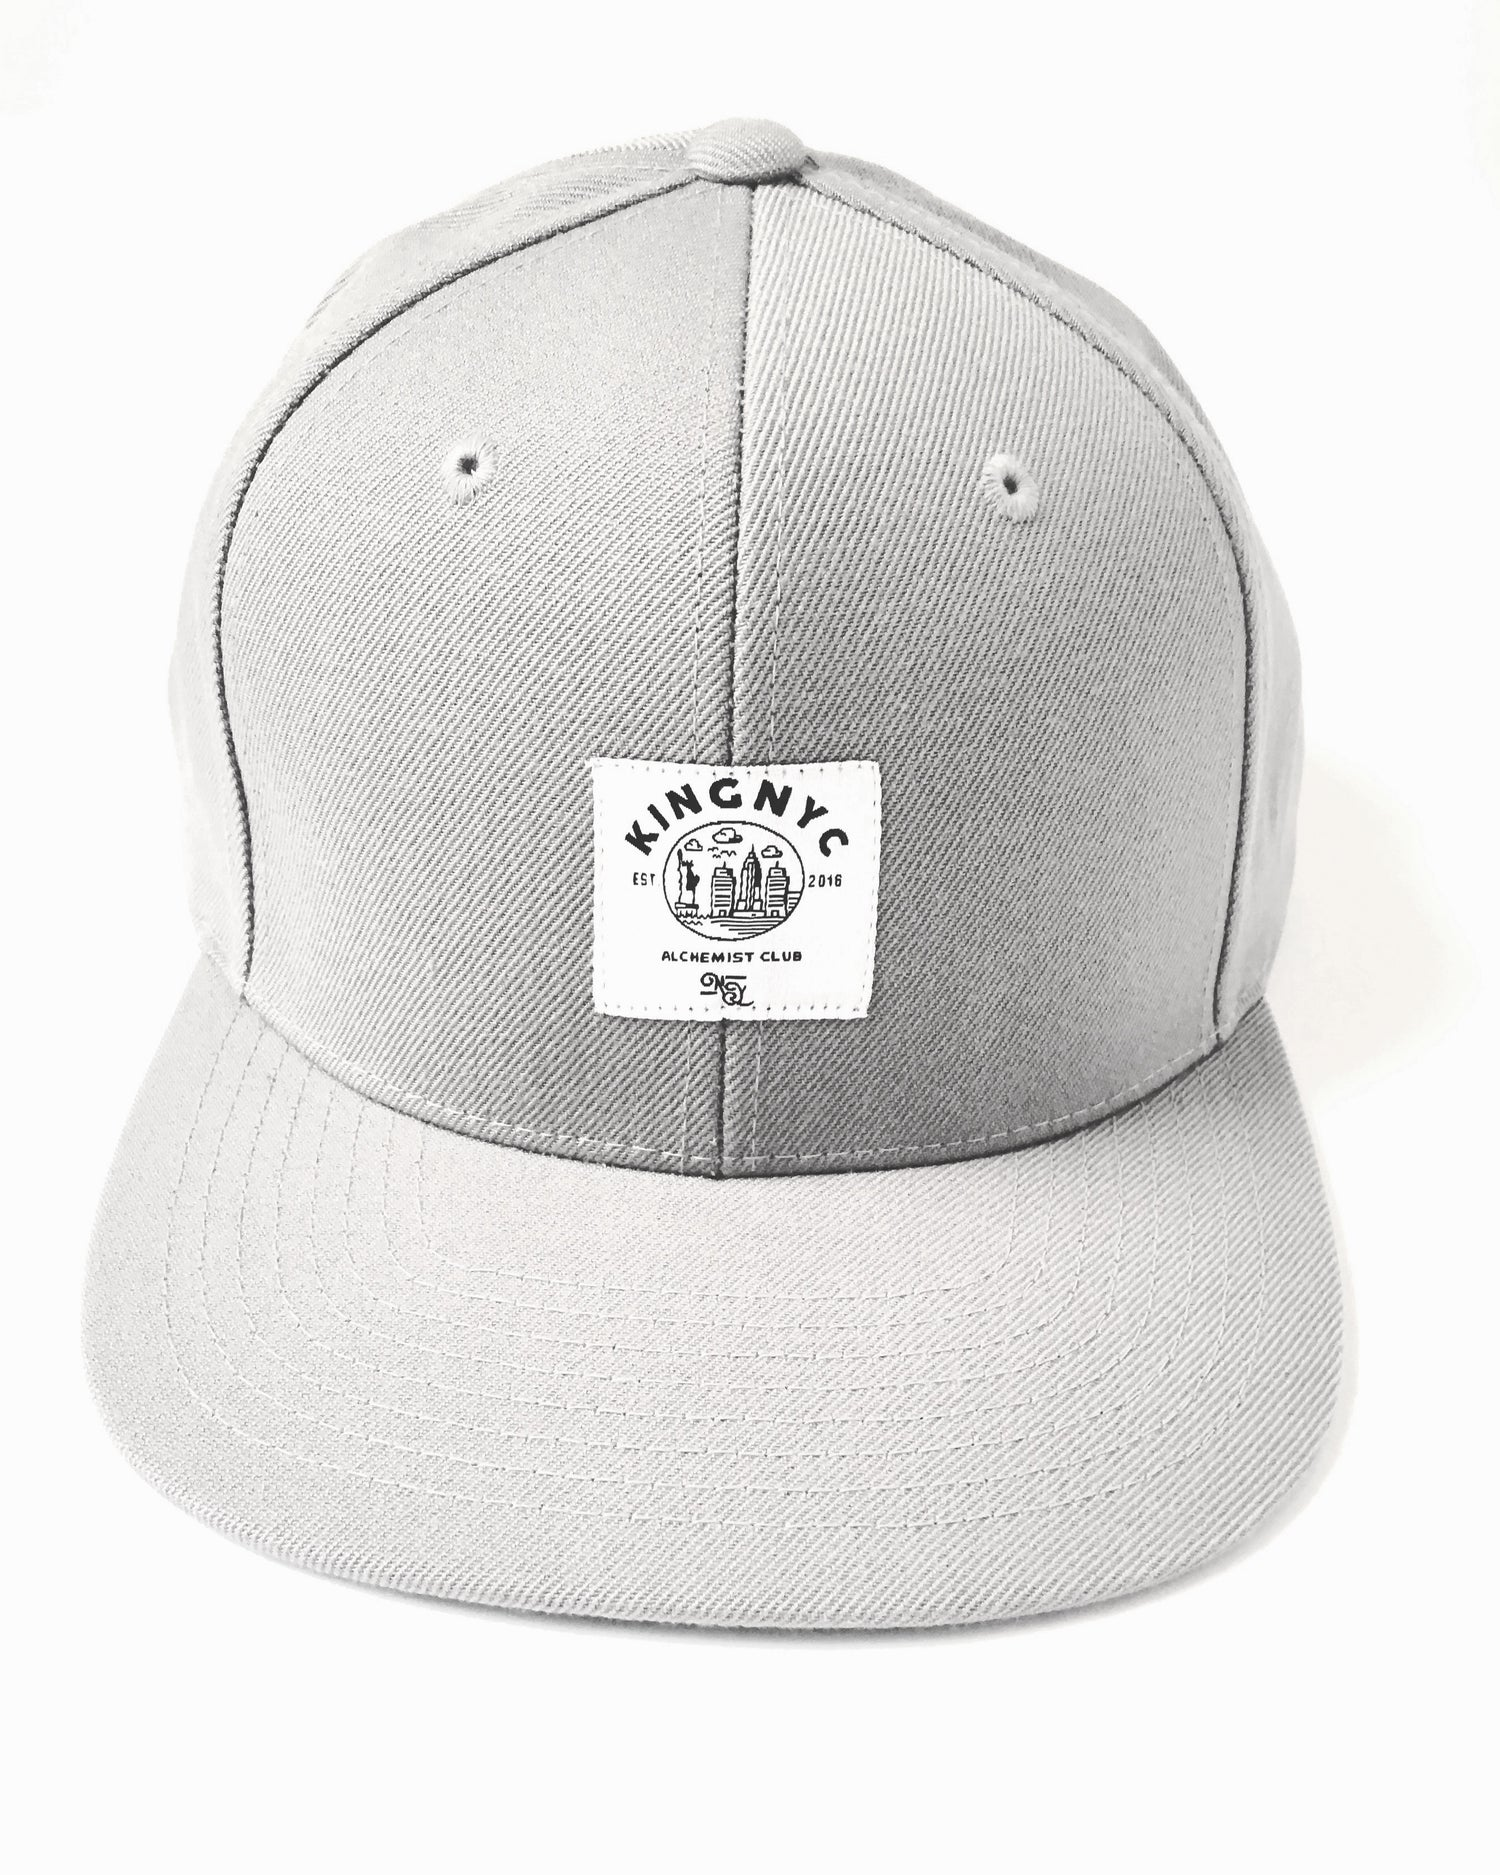 Image of KingNYC Alchemist Club White Label Snapback